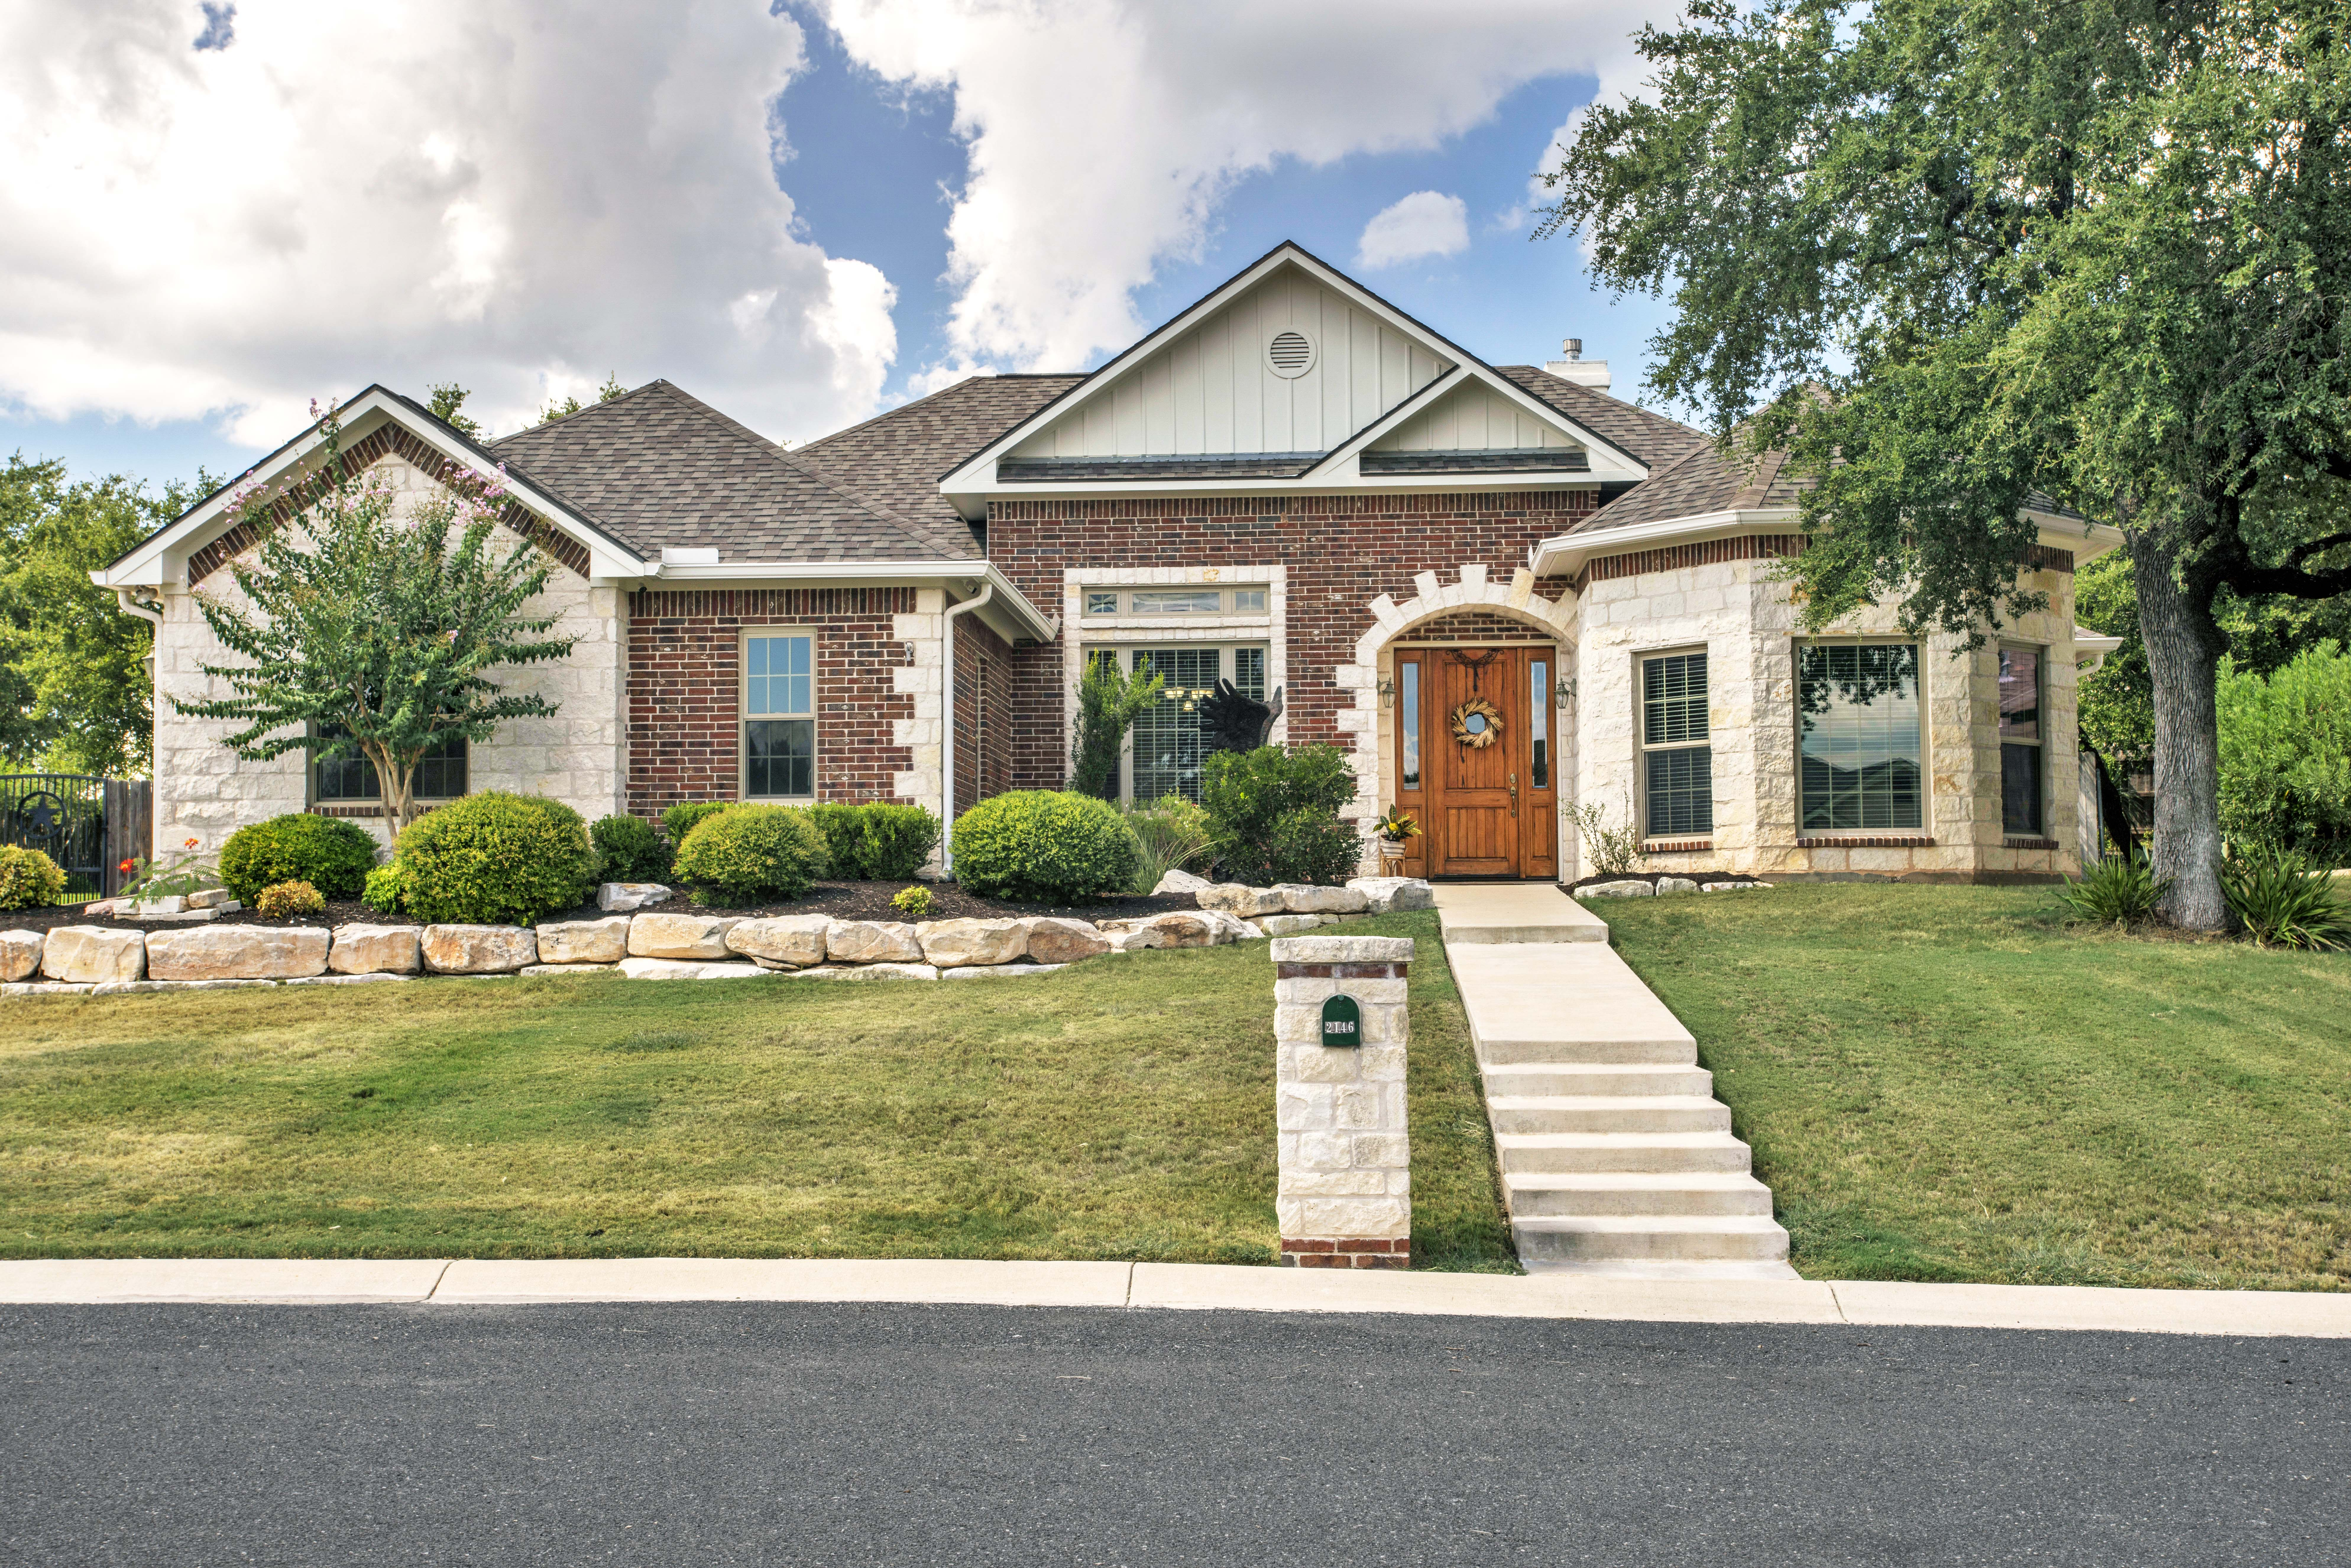 2146 Stone Oak Home For Sale in Stone Ridge, Fredericksburg TX